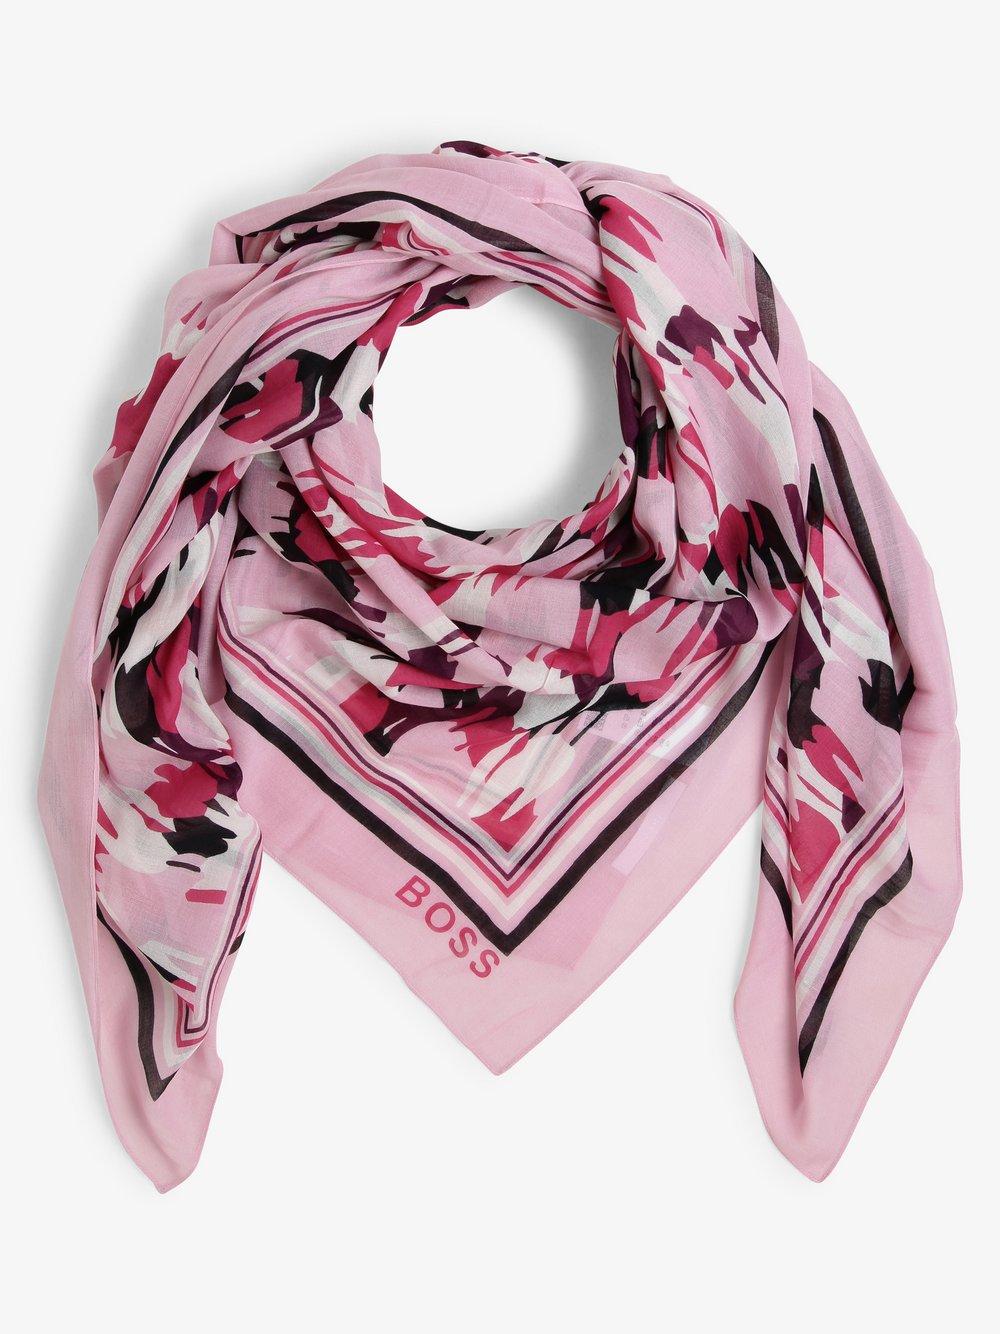 BOSS Casual – Chusta damska – Namellow, różowy Van Graaf 473074-0001-00000